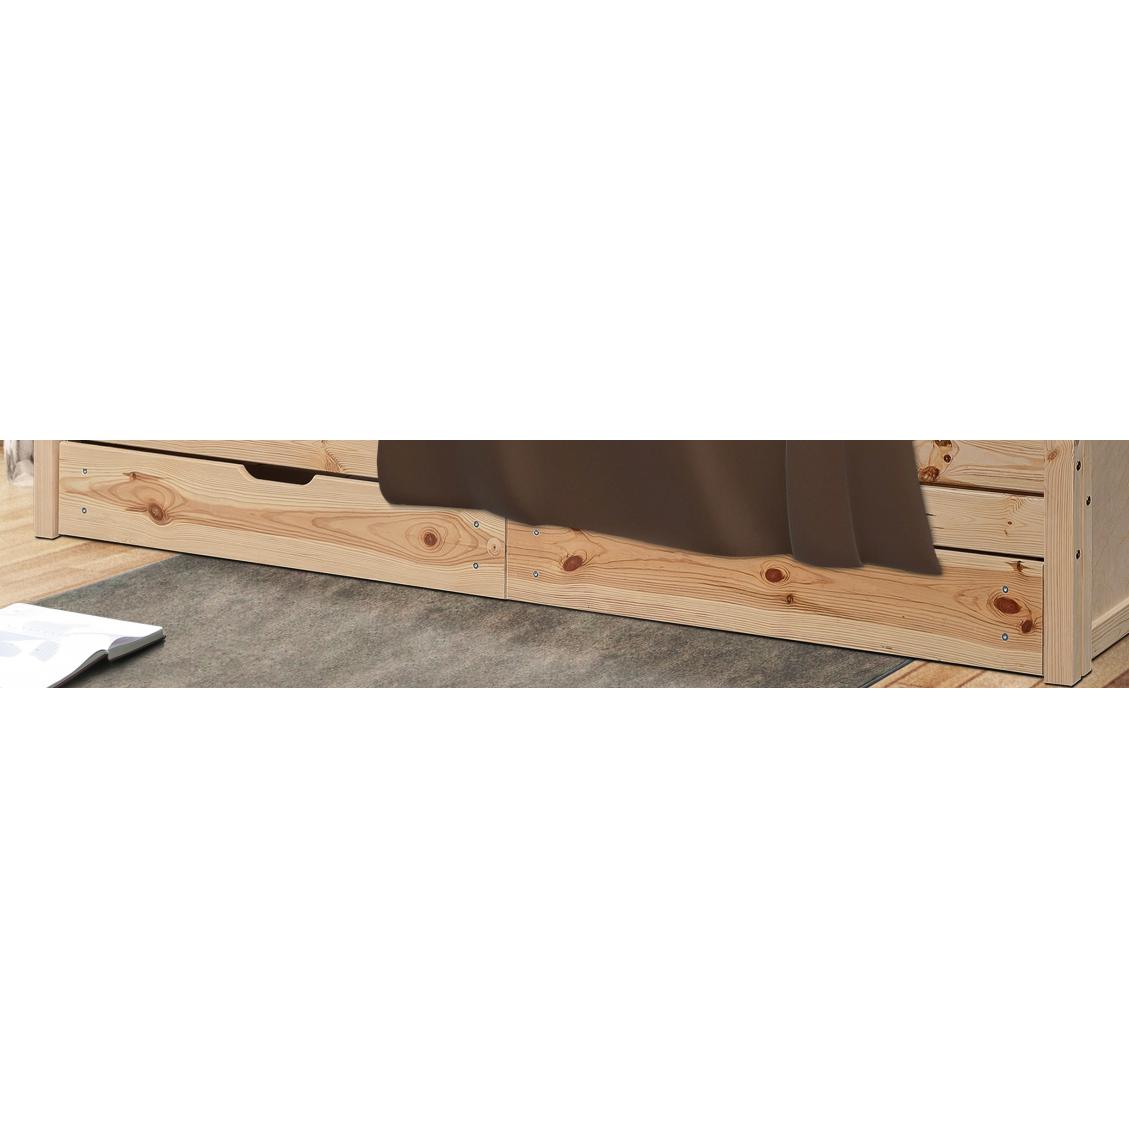 Zestaw 2 szuflad do łóżka Kangur